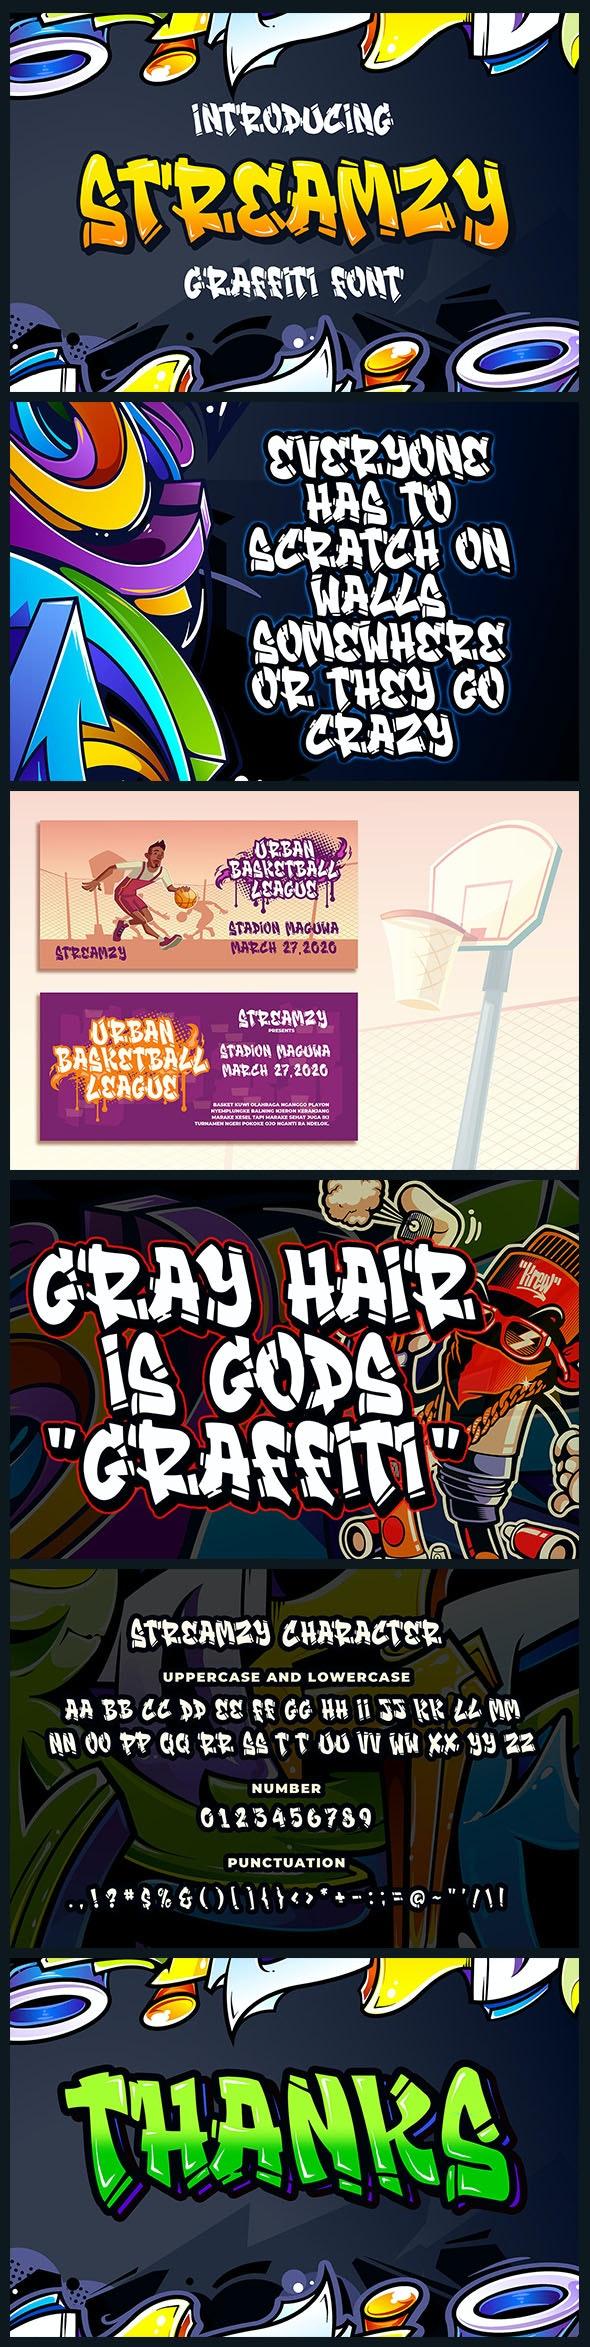 Streamzy - Graffiti Font - Graffiti Fonts